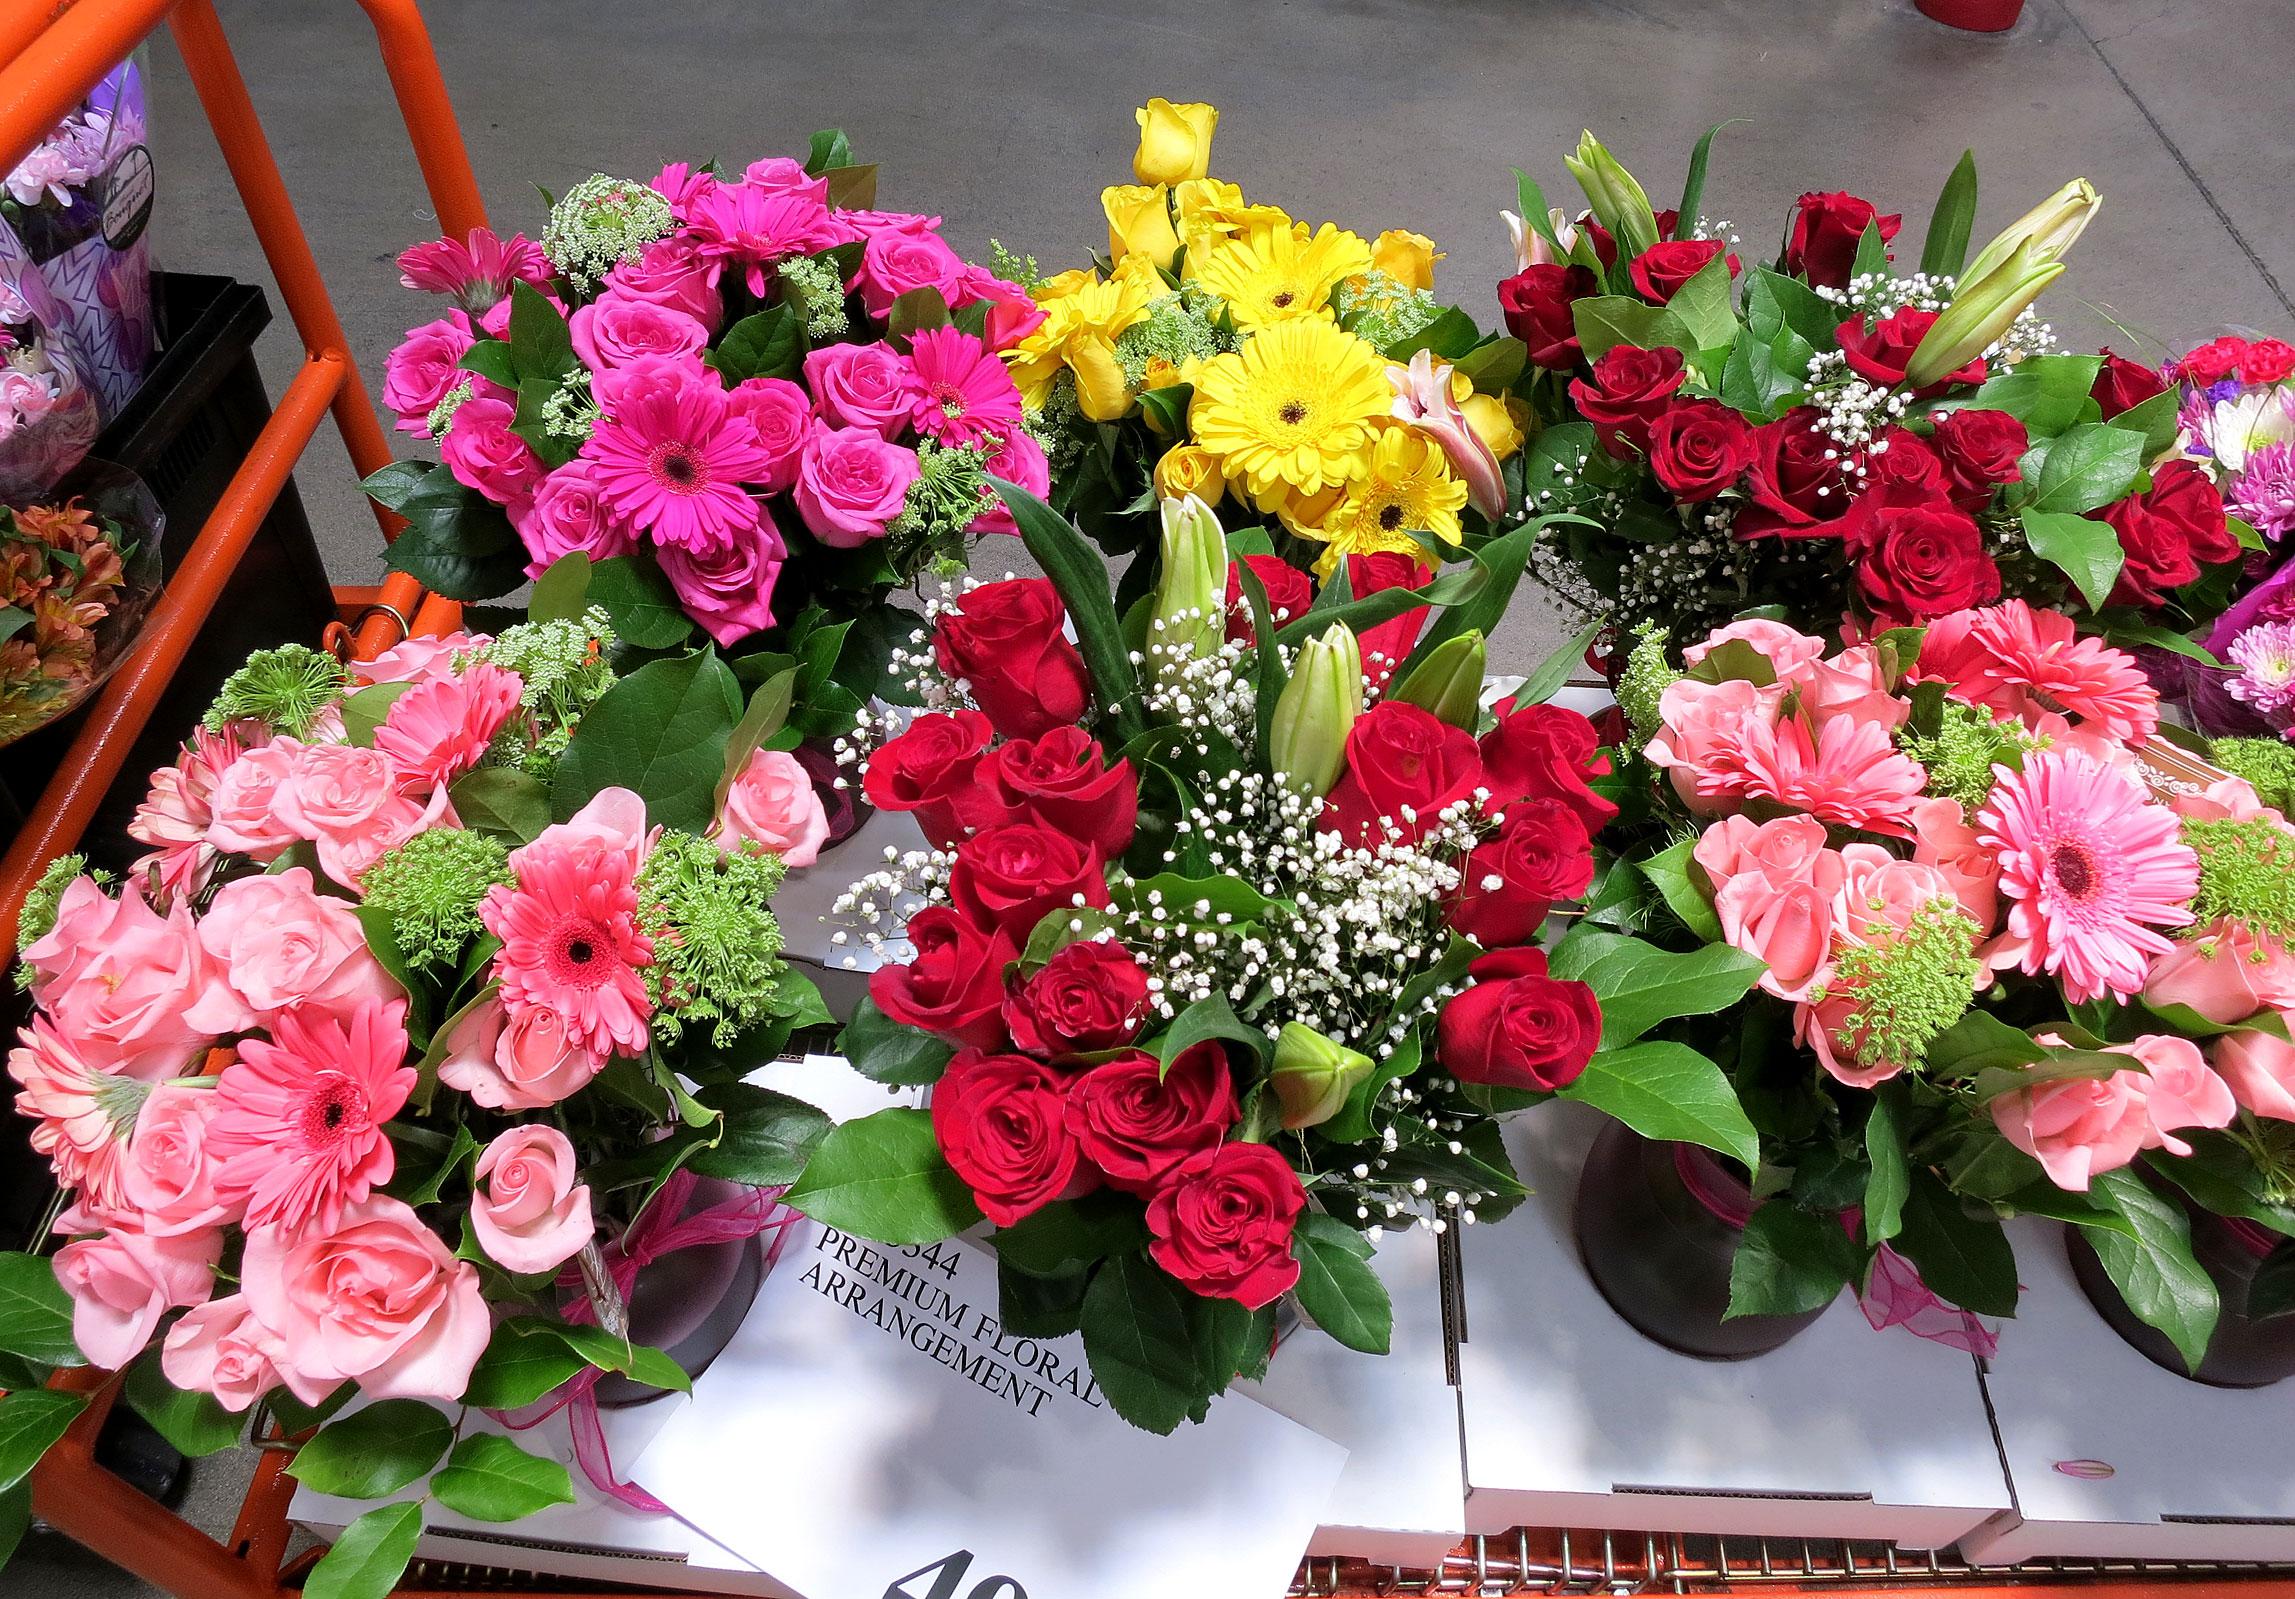 Costco plants and flowers best plants 2017 mother u0027s day flowers u2013 tasty island izmirmasajfo Images